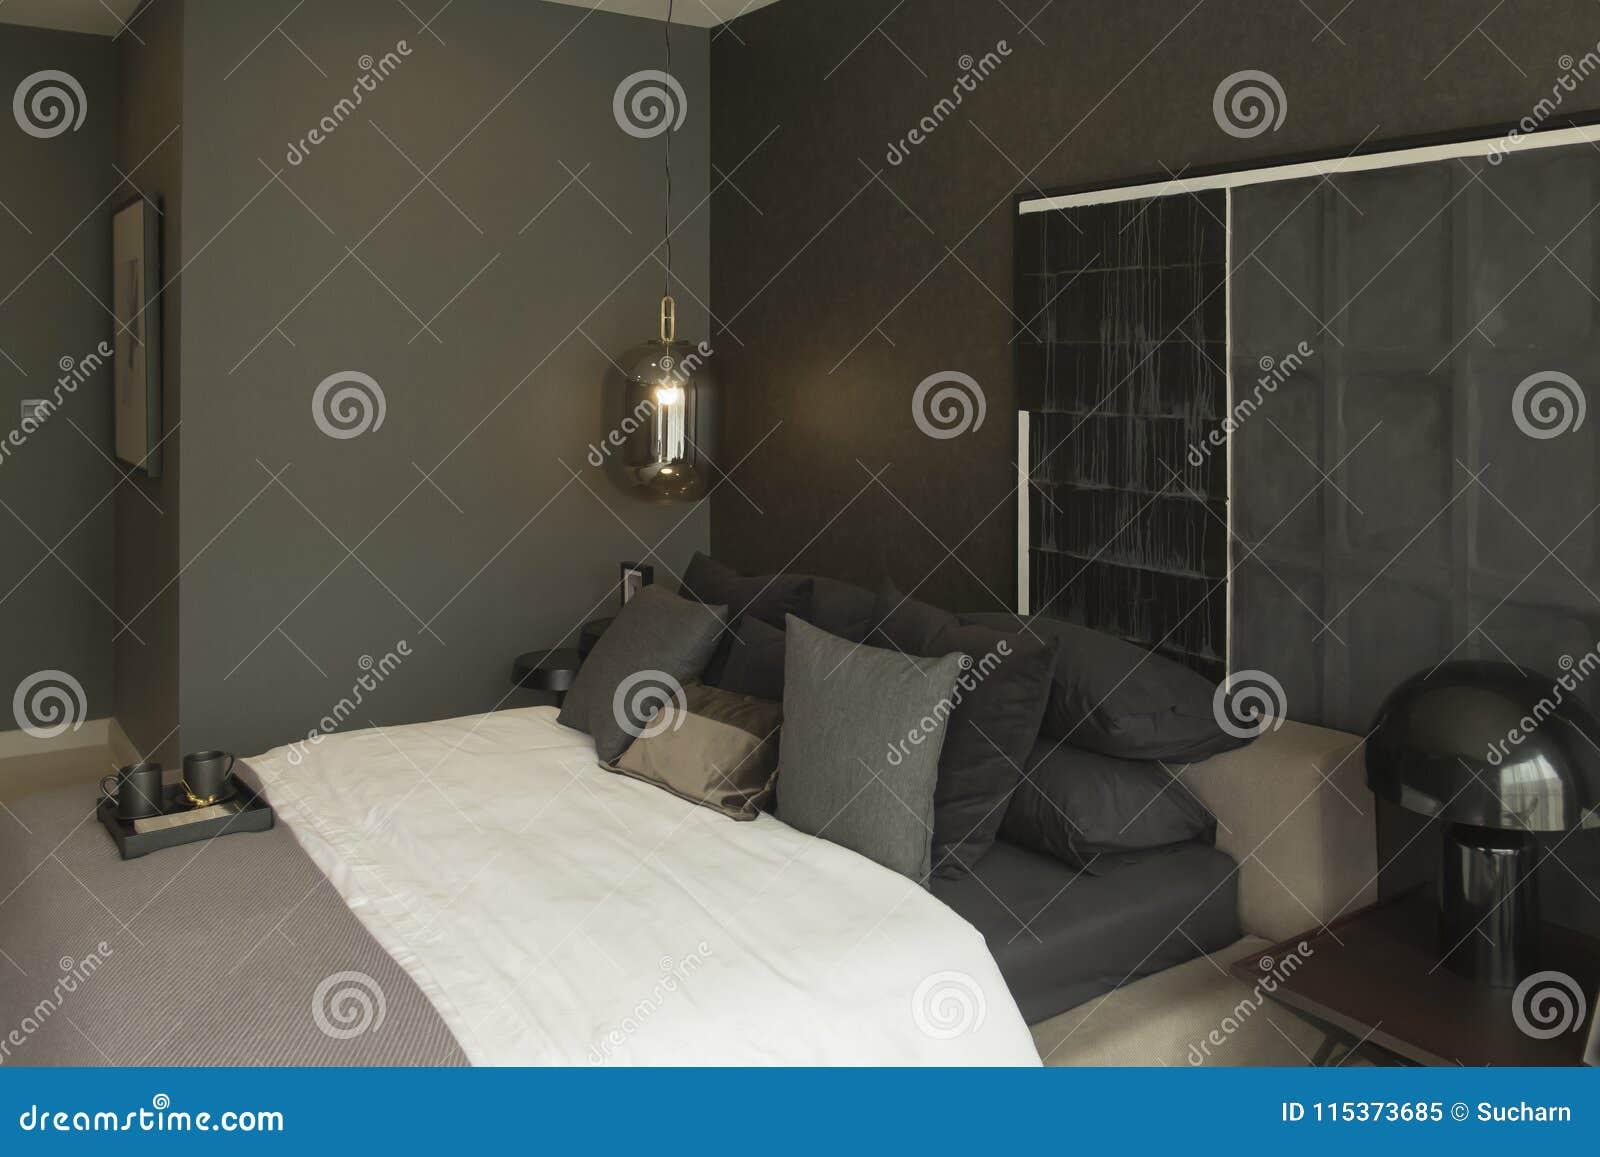 Interior Design Of Bedroom In Dark Themes Bedroom Interior Design In Showroom Stock Image Image Of Cozy Furniture 115373685